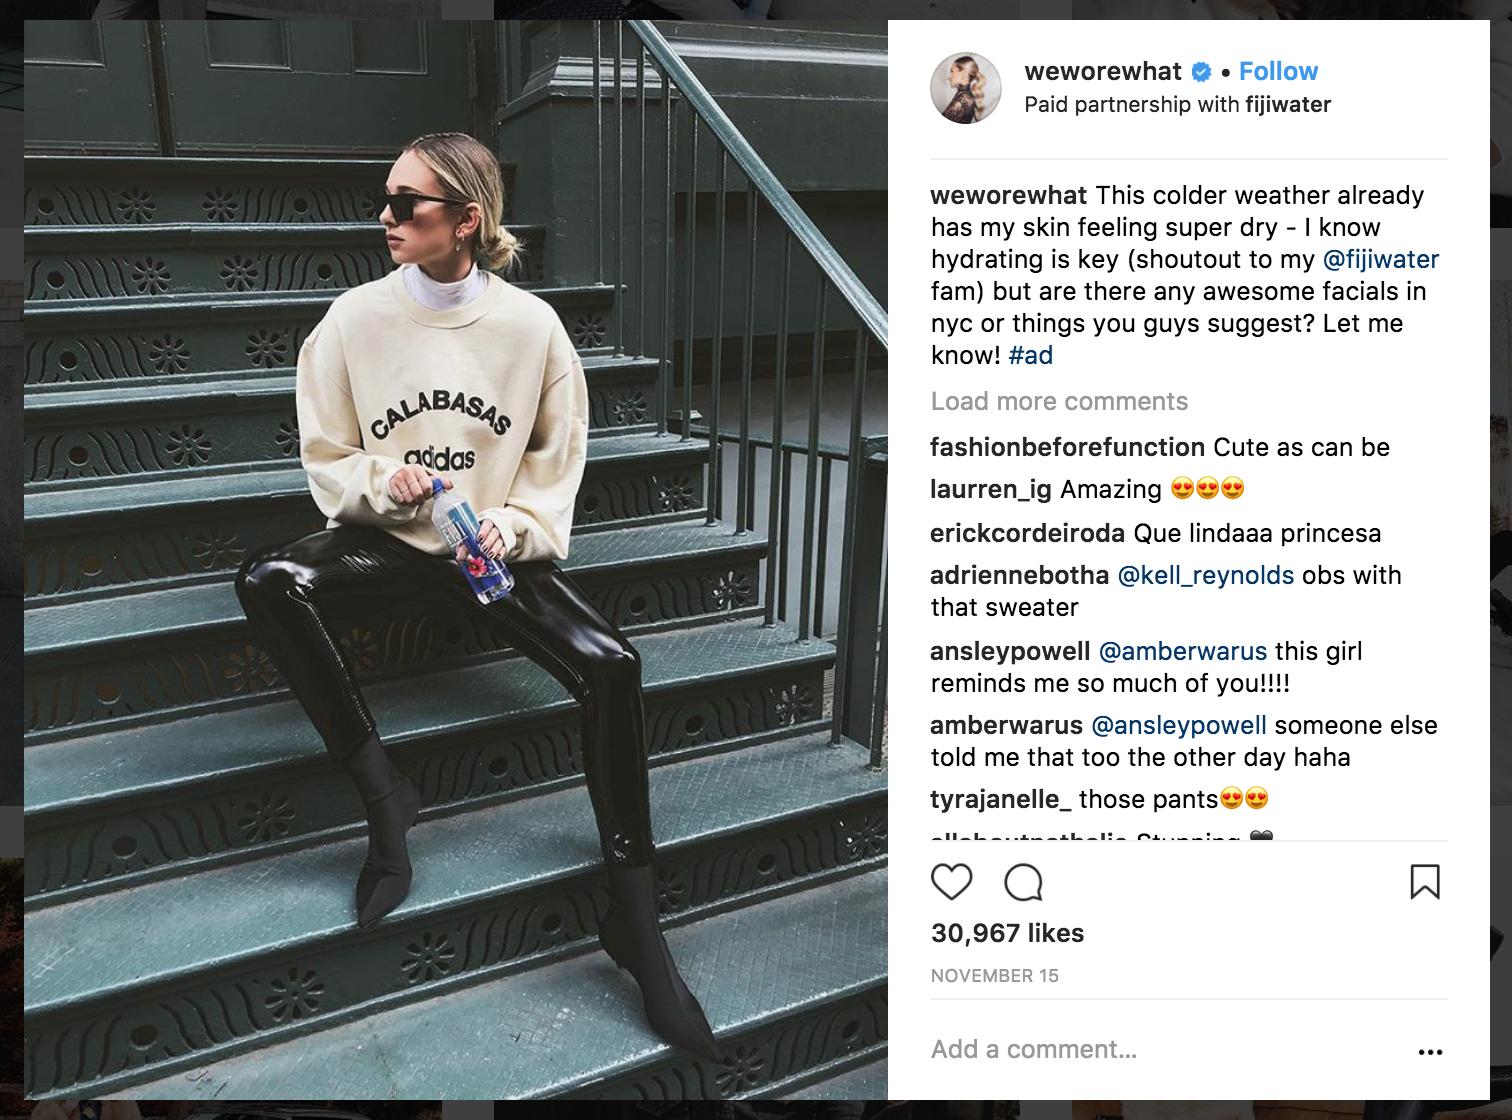 Instagram endorsement disclosure